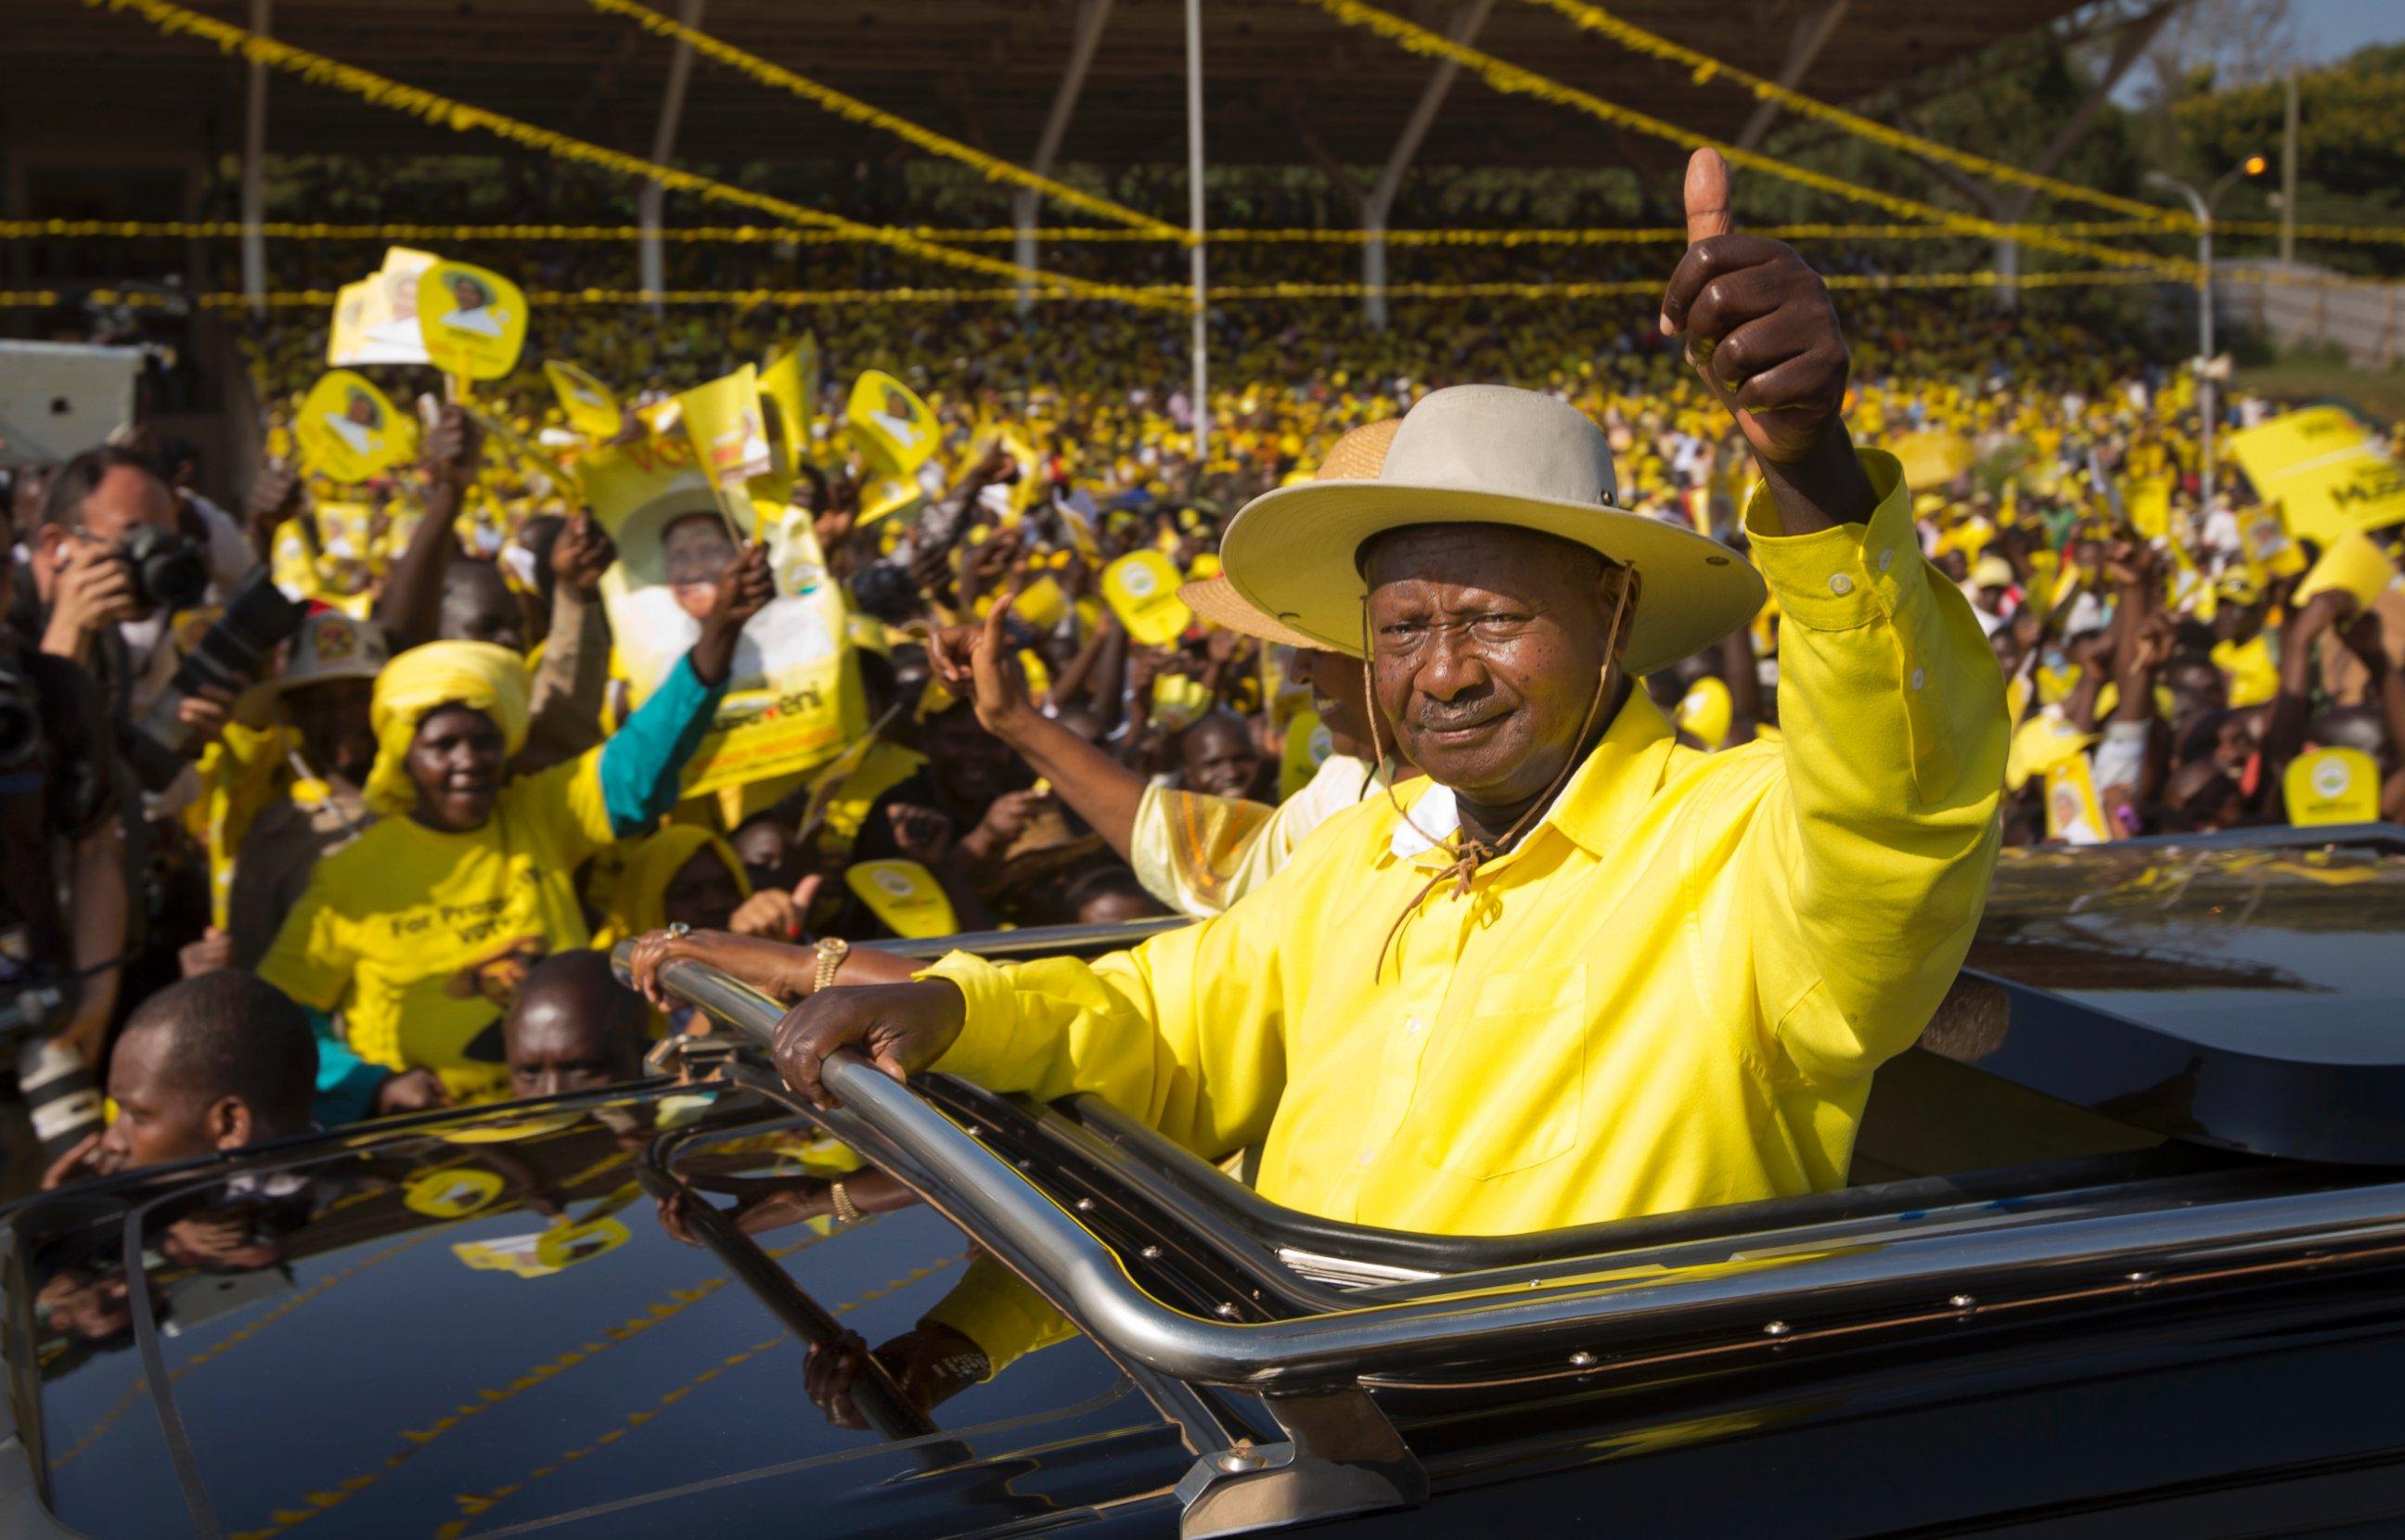 Yoweri Museveni Red Pepper tabloid unbanned